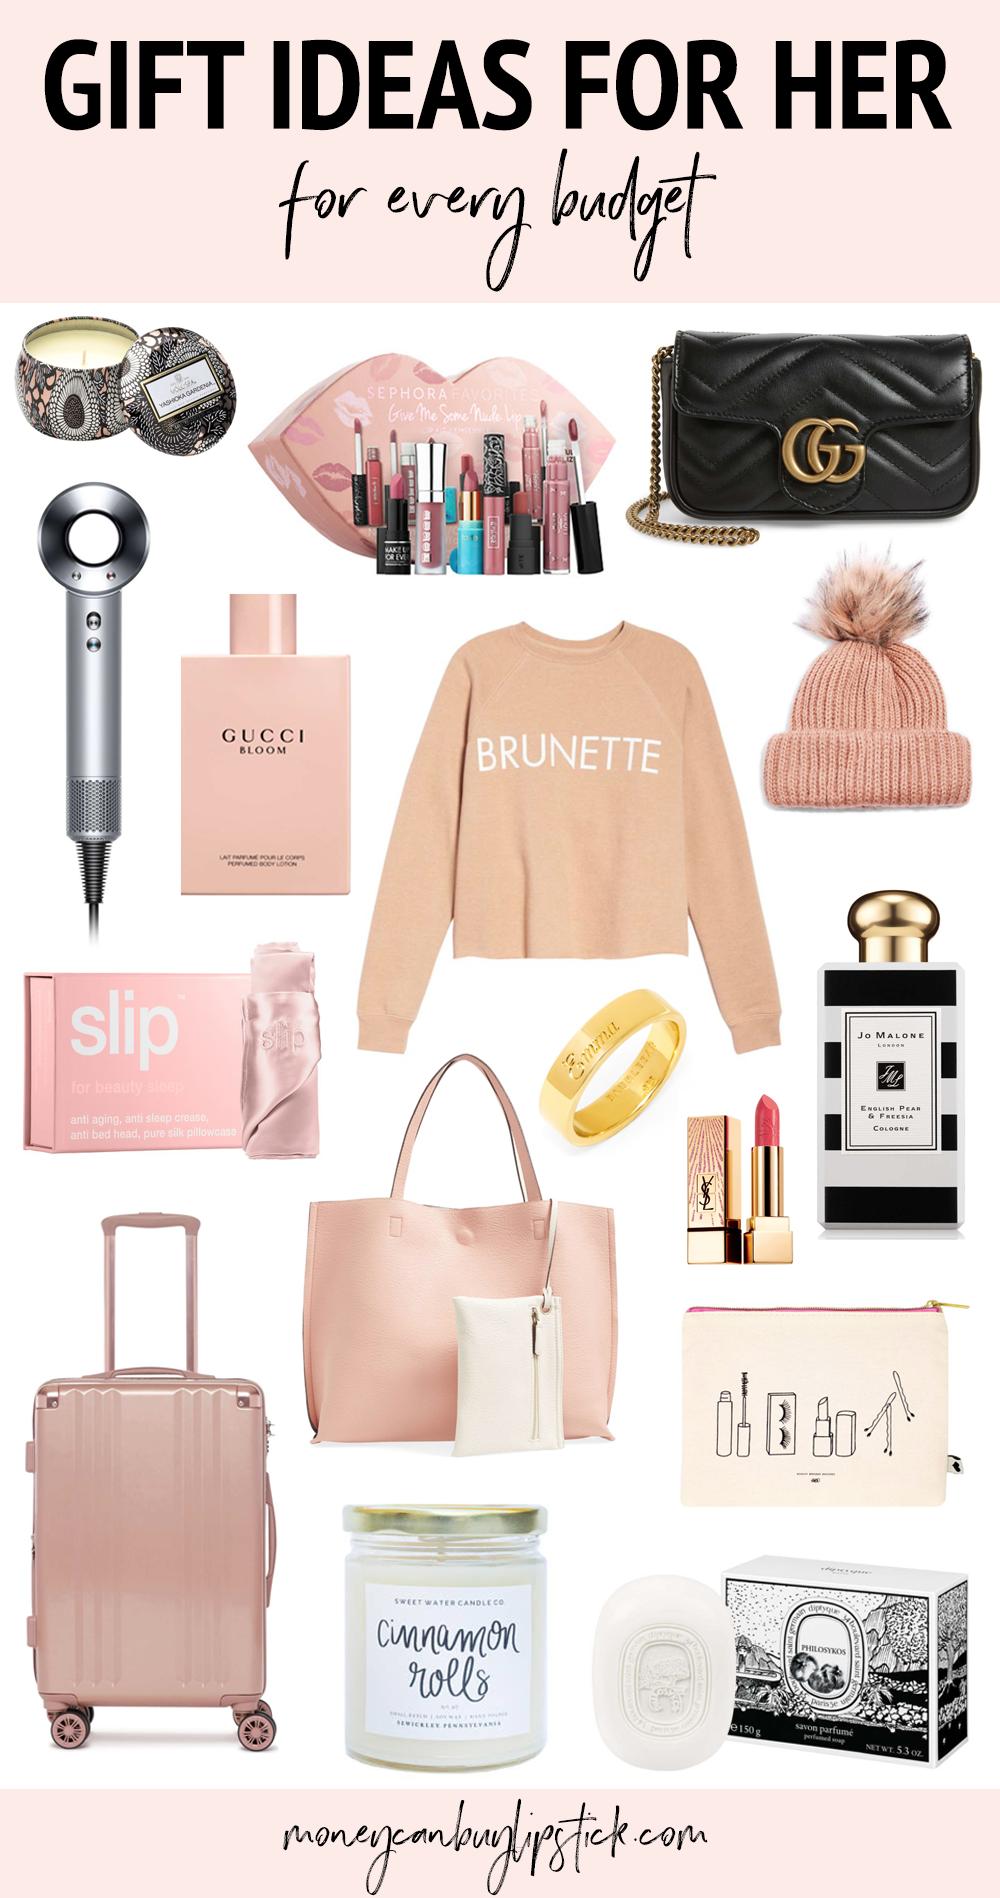 Christmas gift ideas for female cousin